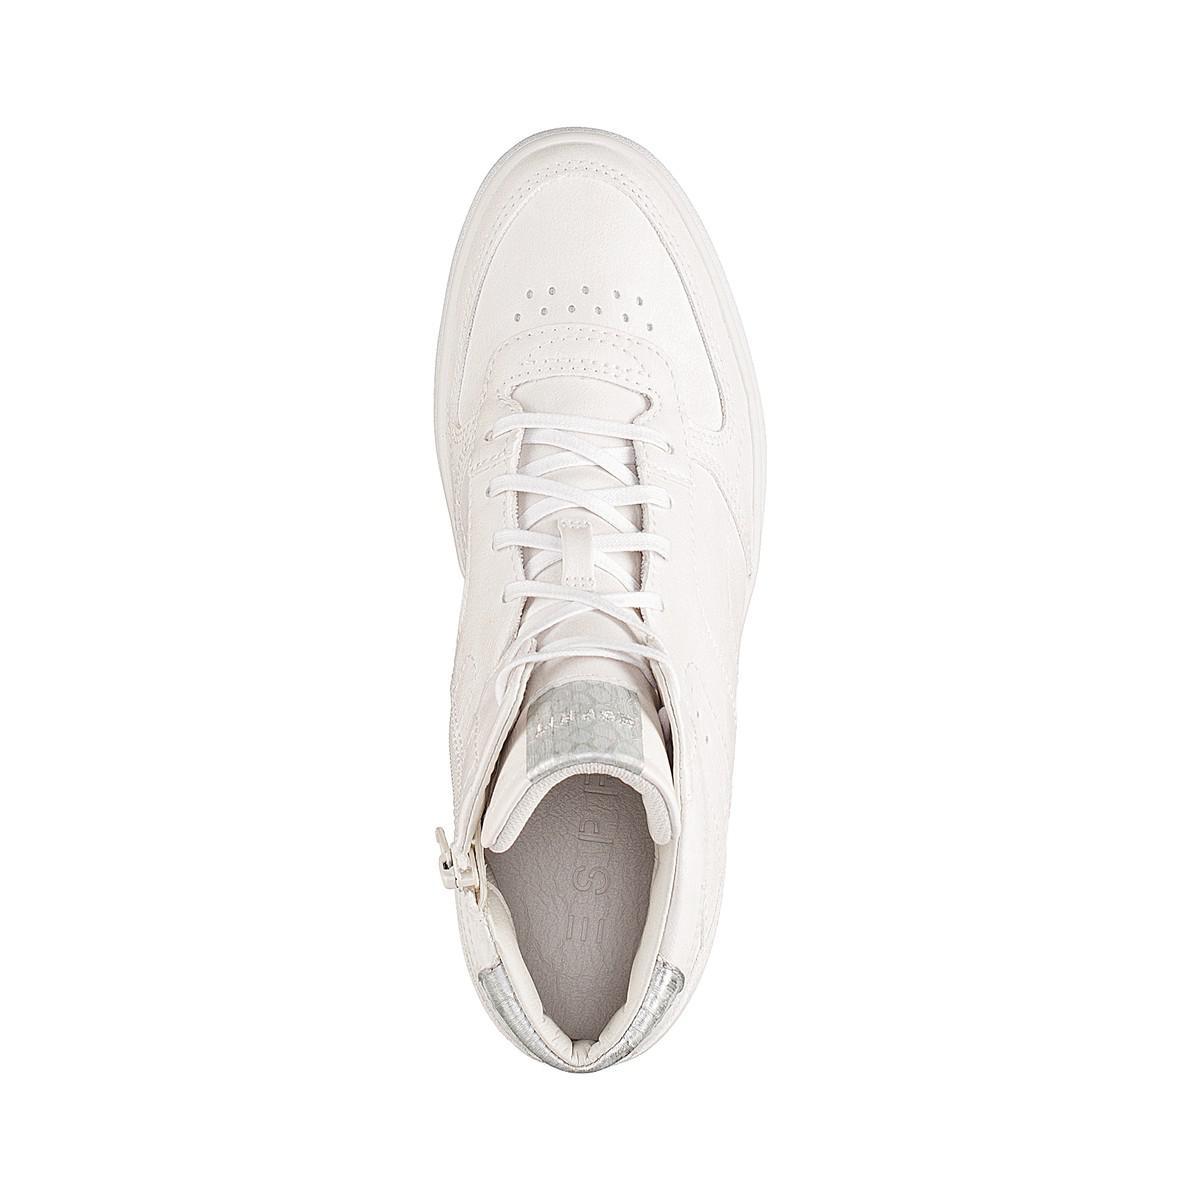 EspritSTAR WEDGE - High-top trainers - offwhite I4kajlE4